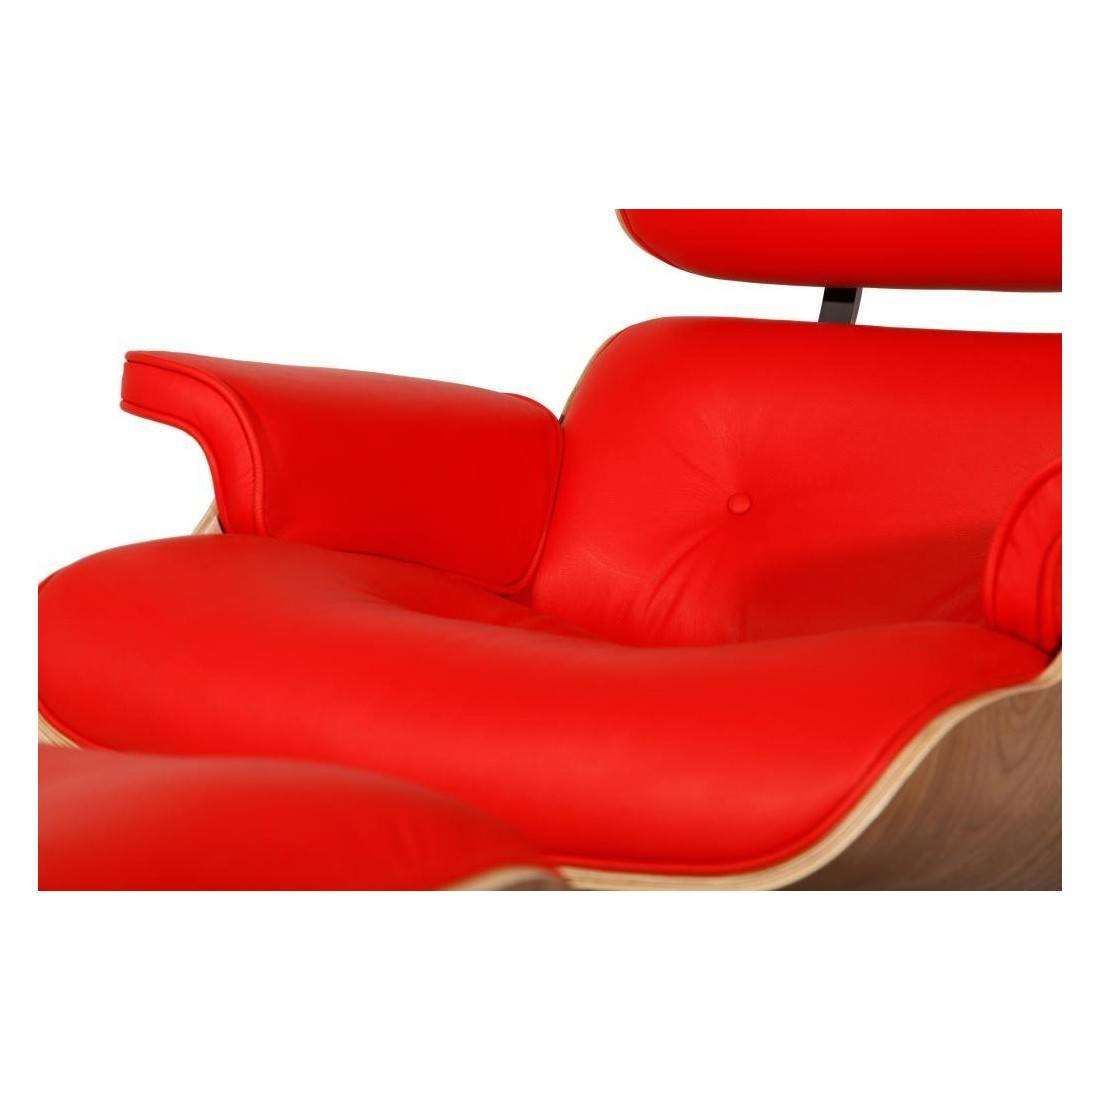 Mod Lounge Chair Amp Ottoman Red Walnut